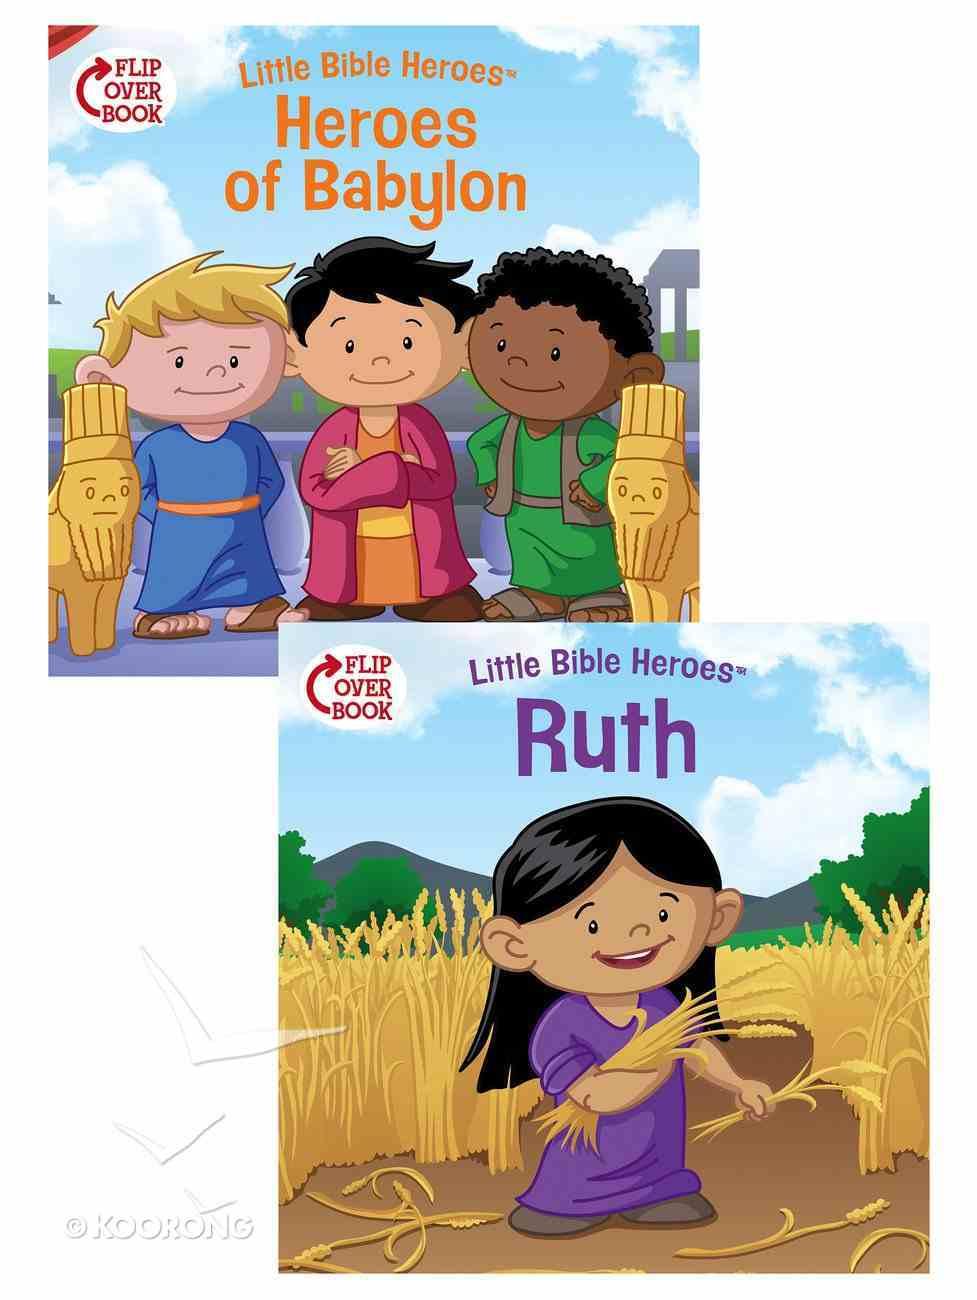 Heroes of Babylon/Ruth Flip-Over Book (Little Bible Heroes Series) Paperback